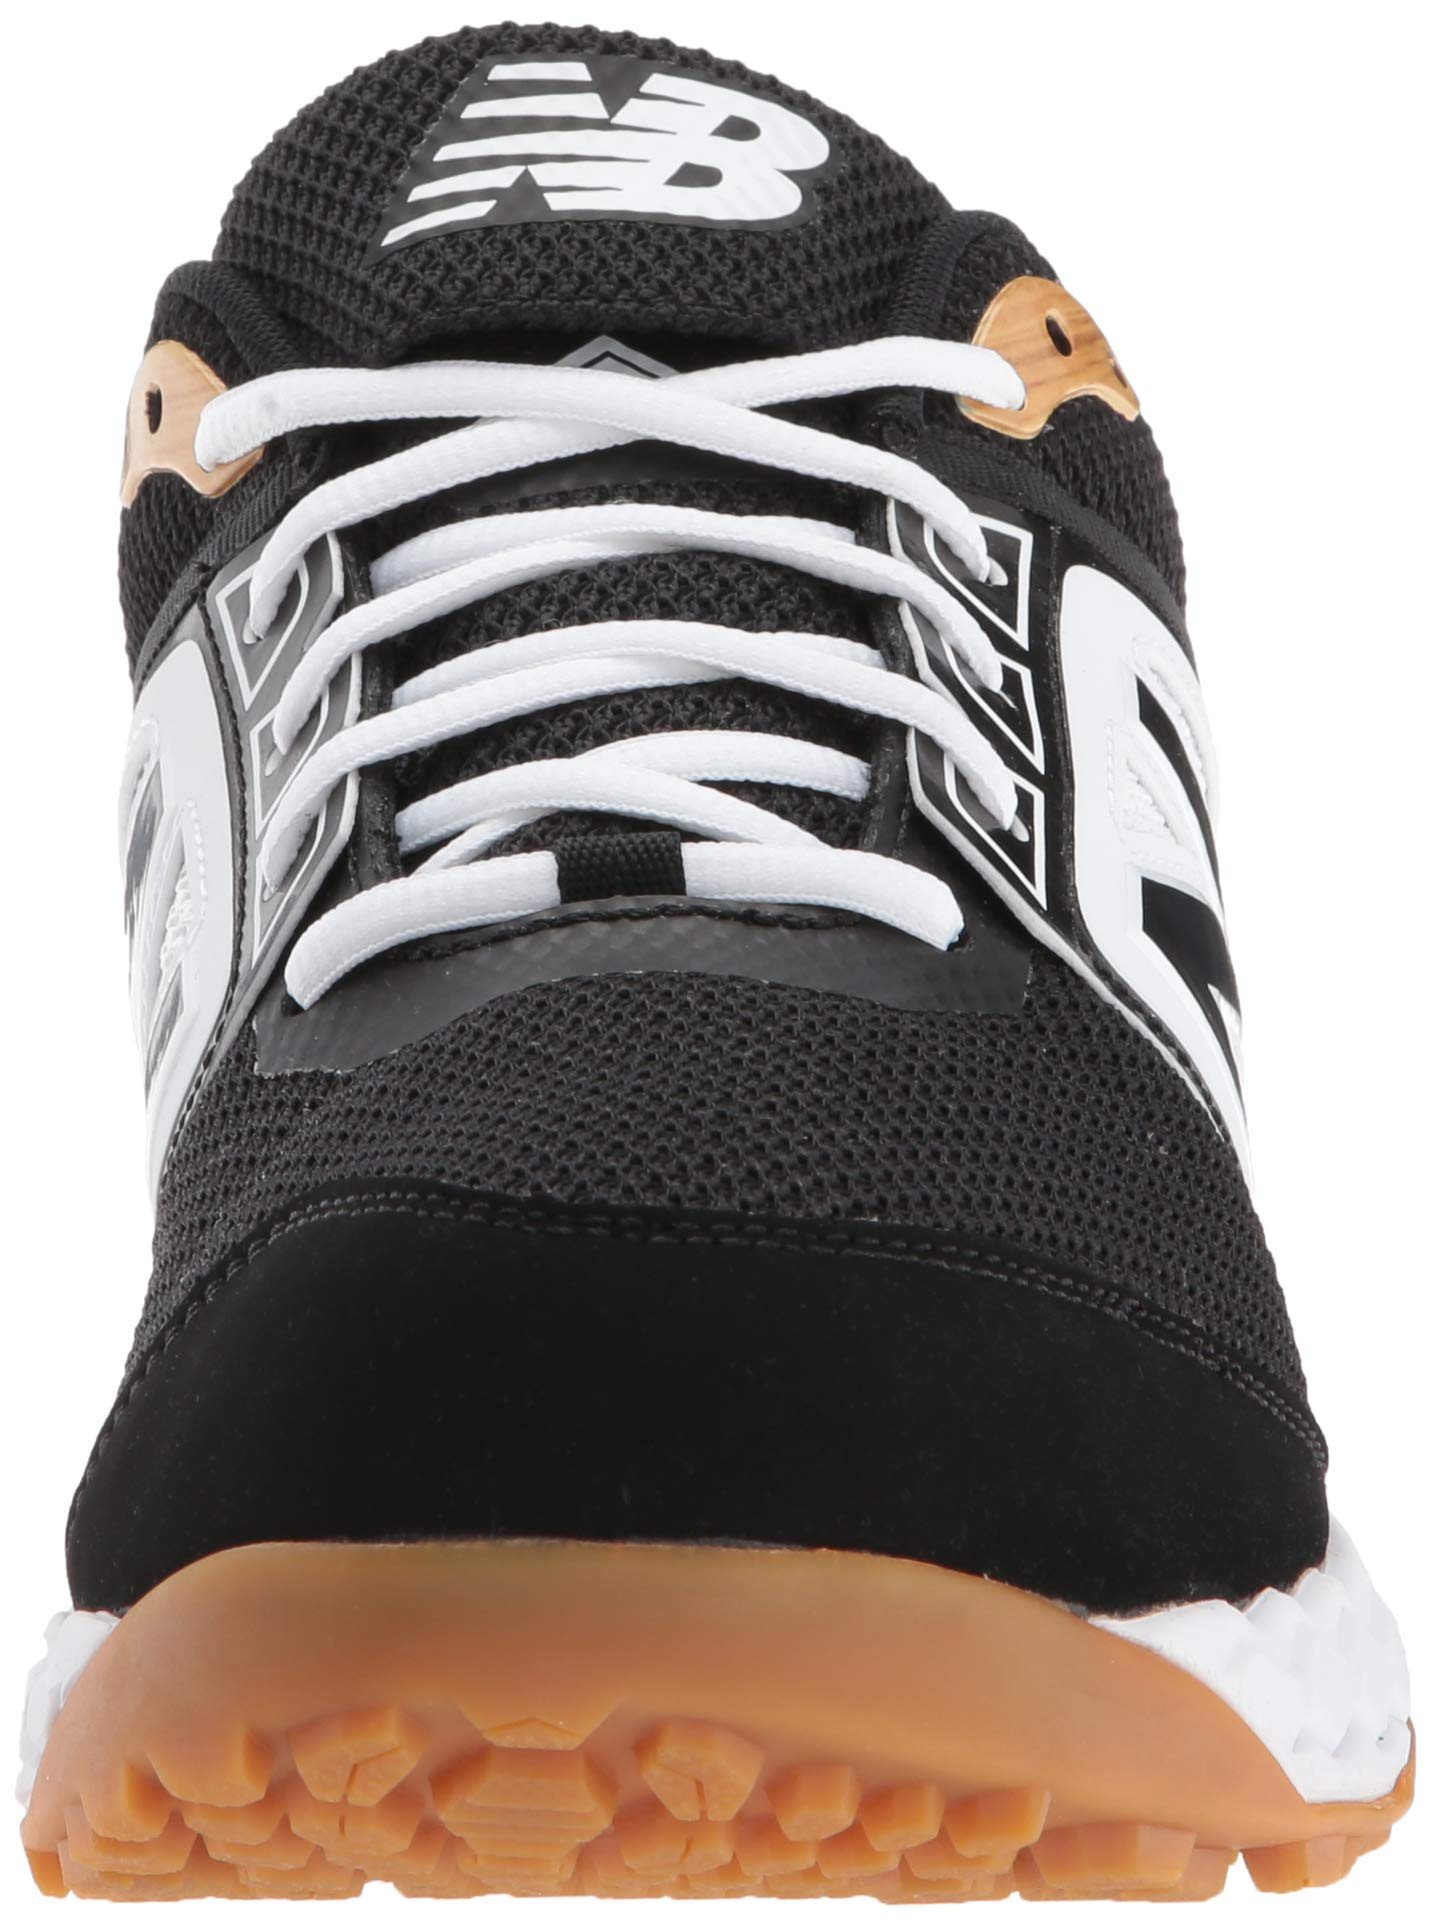 New Balance Men's 3000v4 Turf Baseball Shoe, Black/White, 5 D US by New Balance (Image #4)